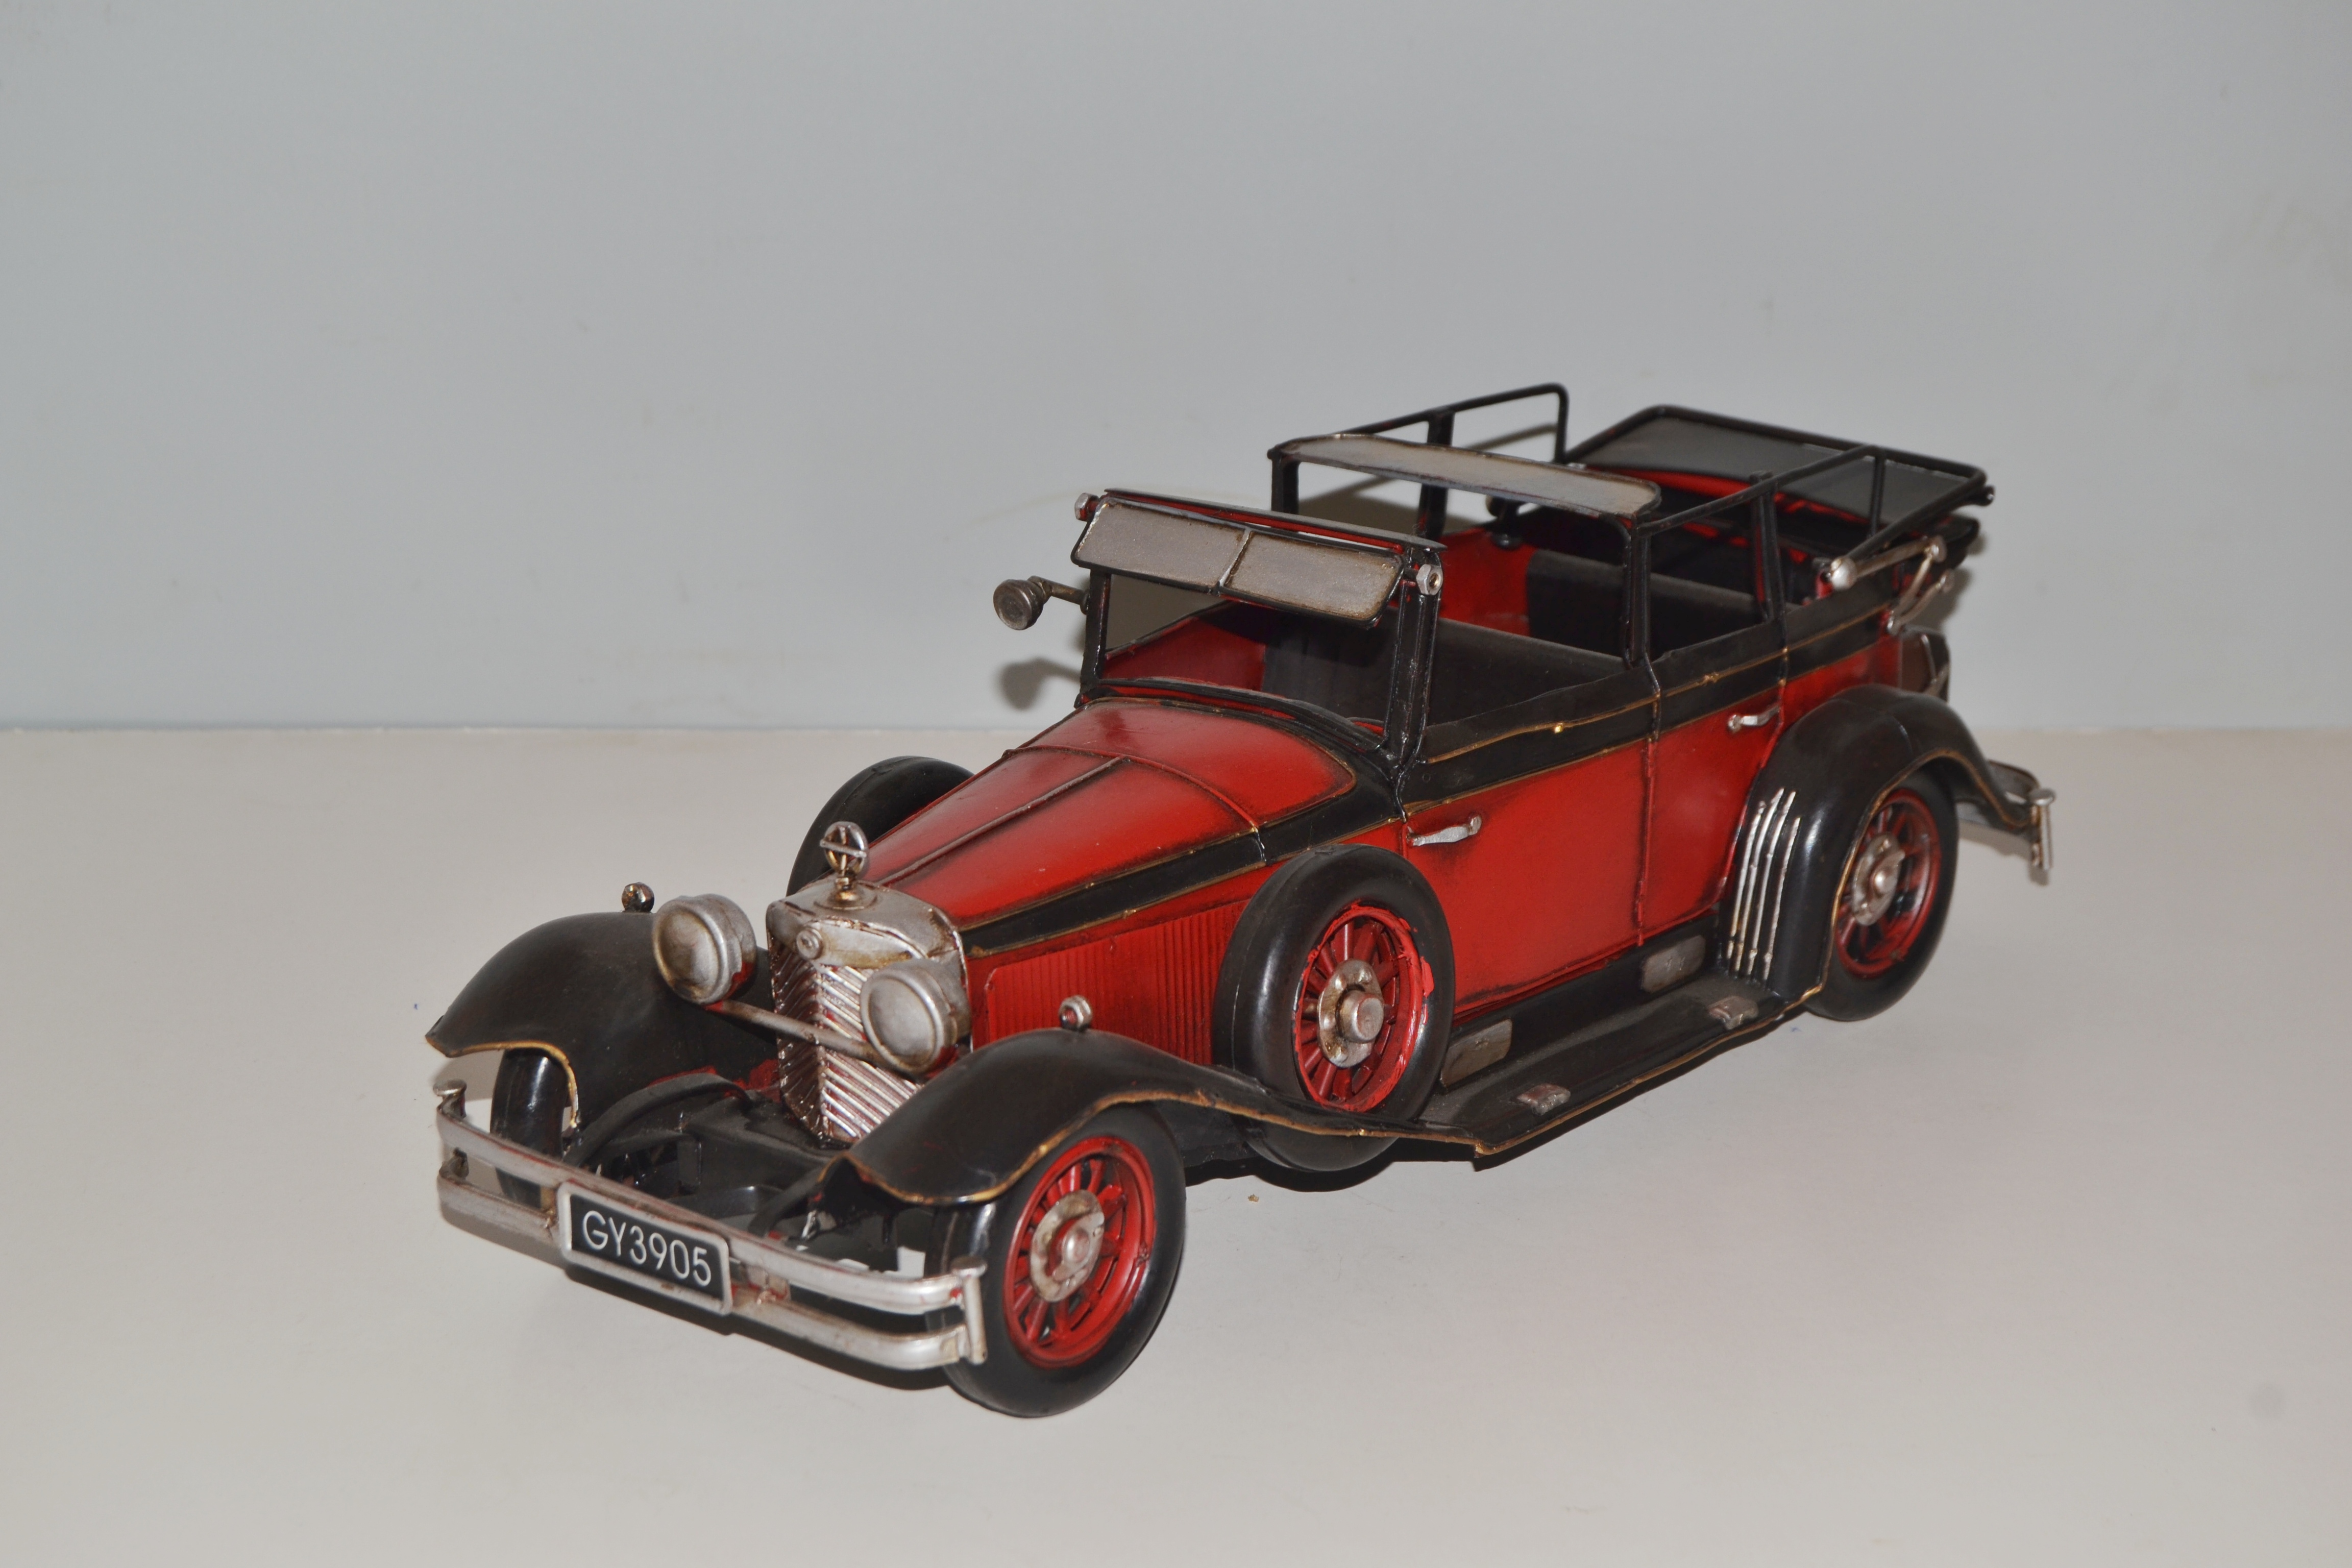 mercedes benz 770 k modell cabrio blechmodell automodell. Black Bedroom Furniture Sets. Home Design Ideas